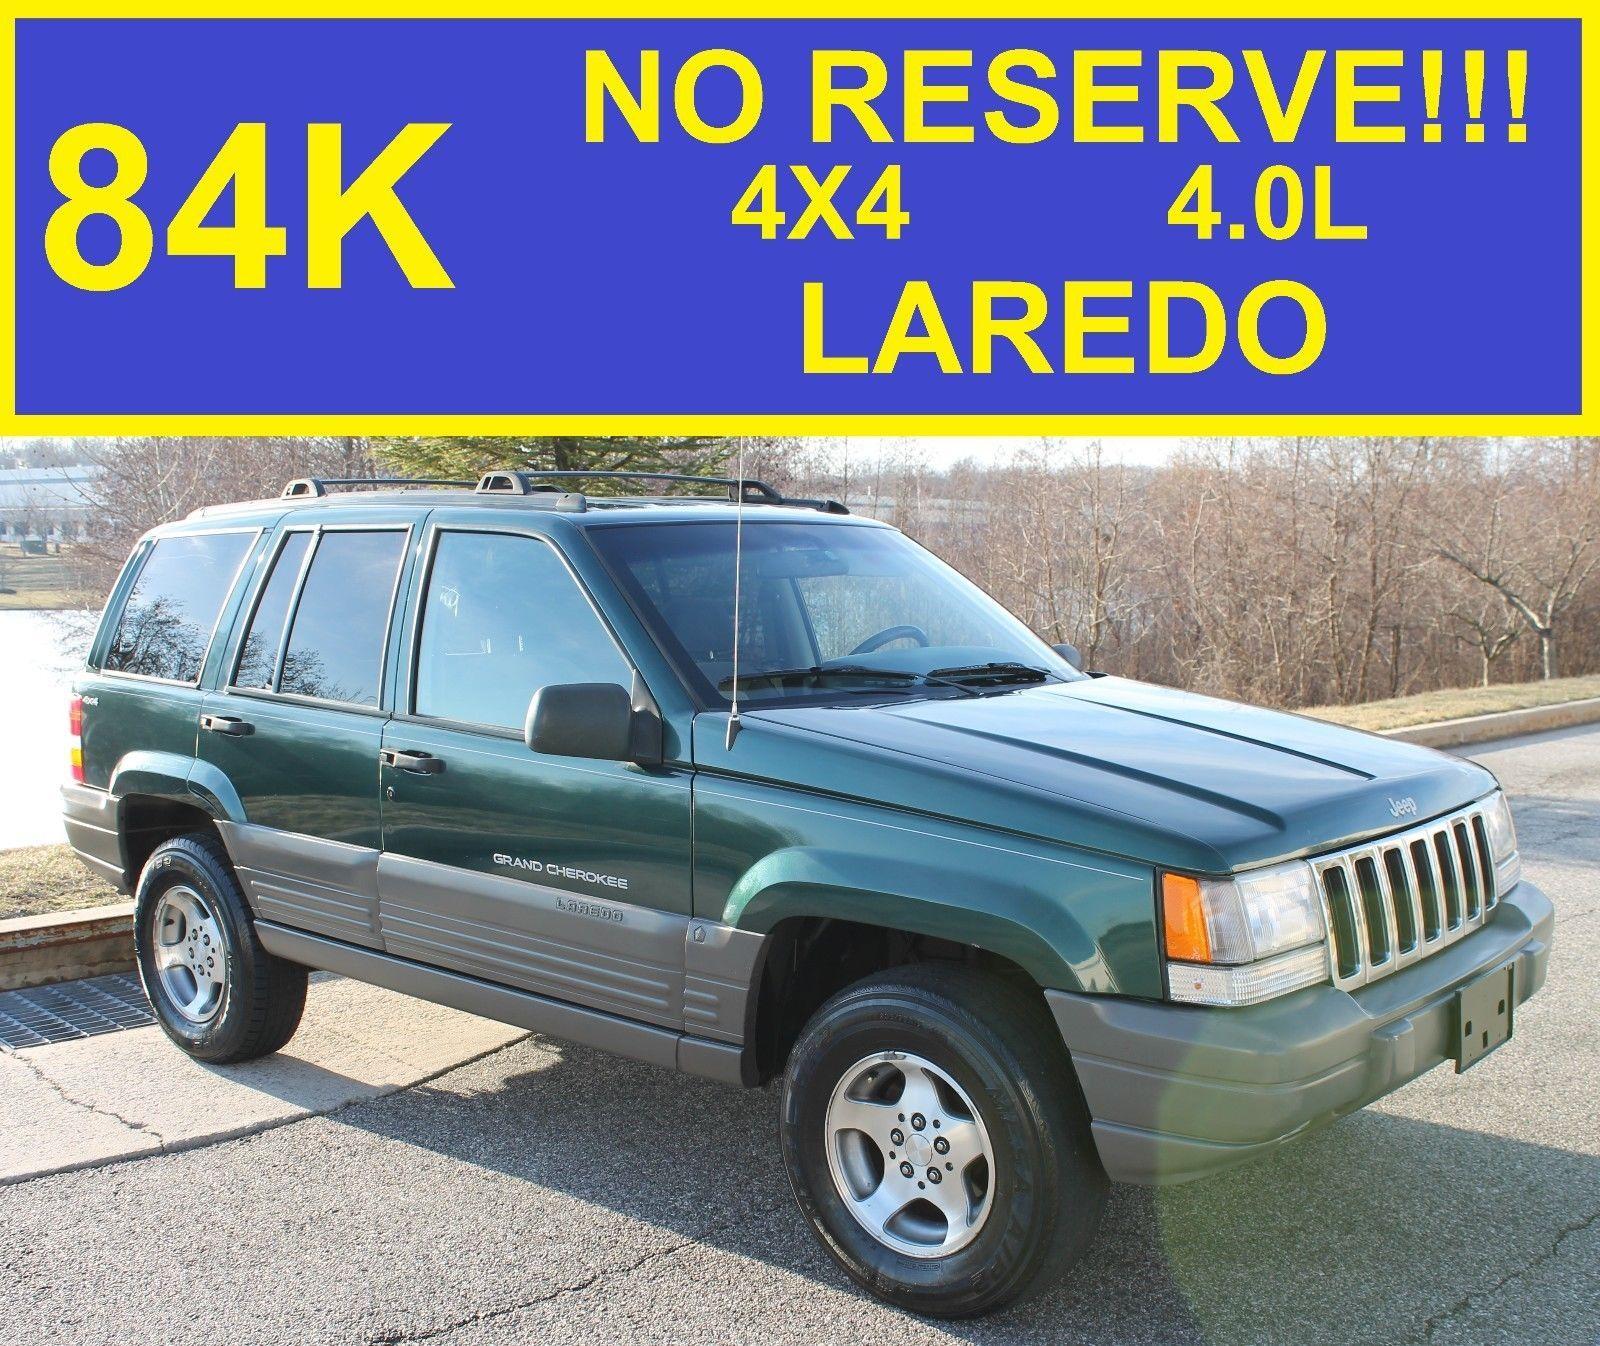 1998 Jeep Grand Cherokee Laredo >> 1998 Jeep Grand Cherokee Laredo No Reserve Laredo 84k Jeep